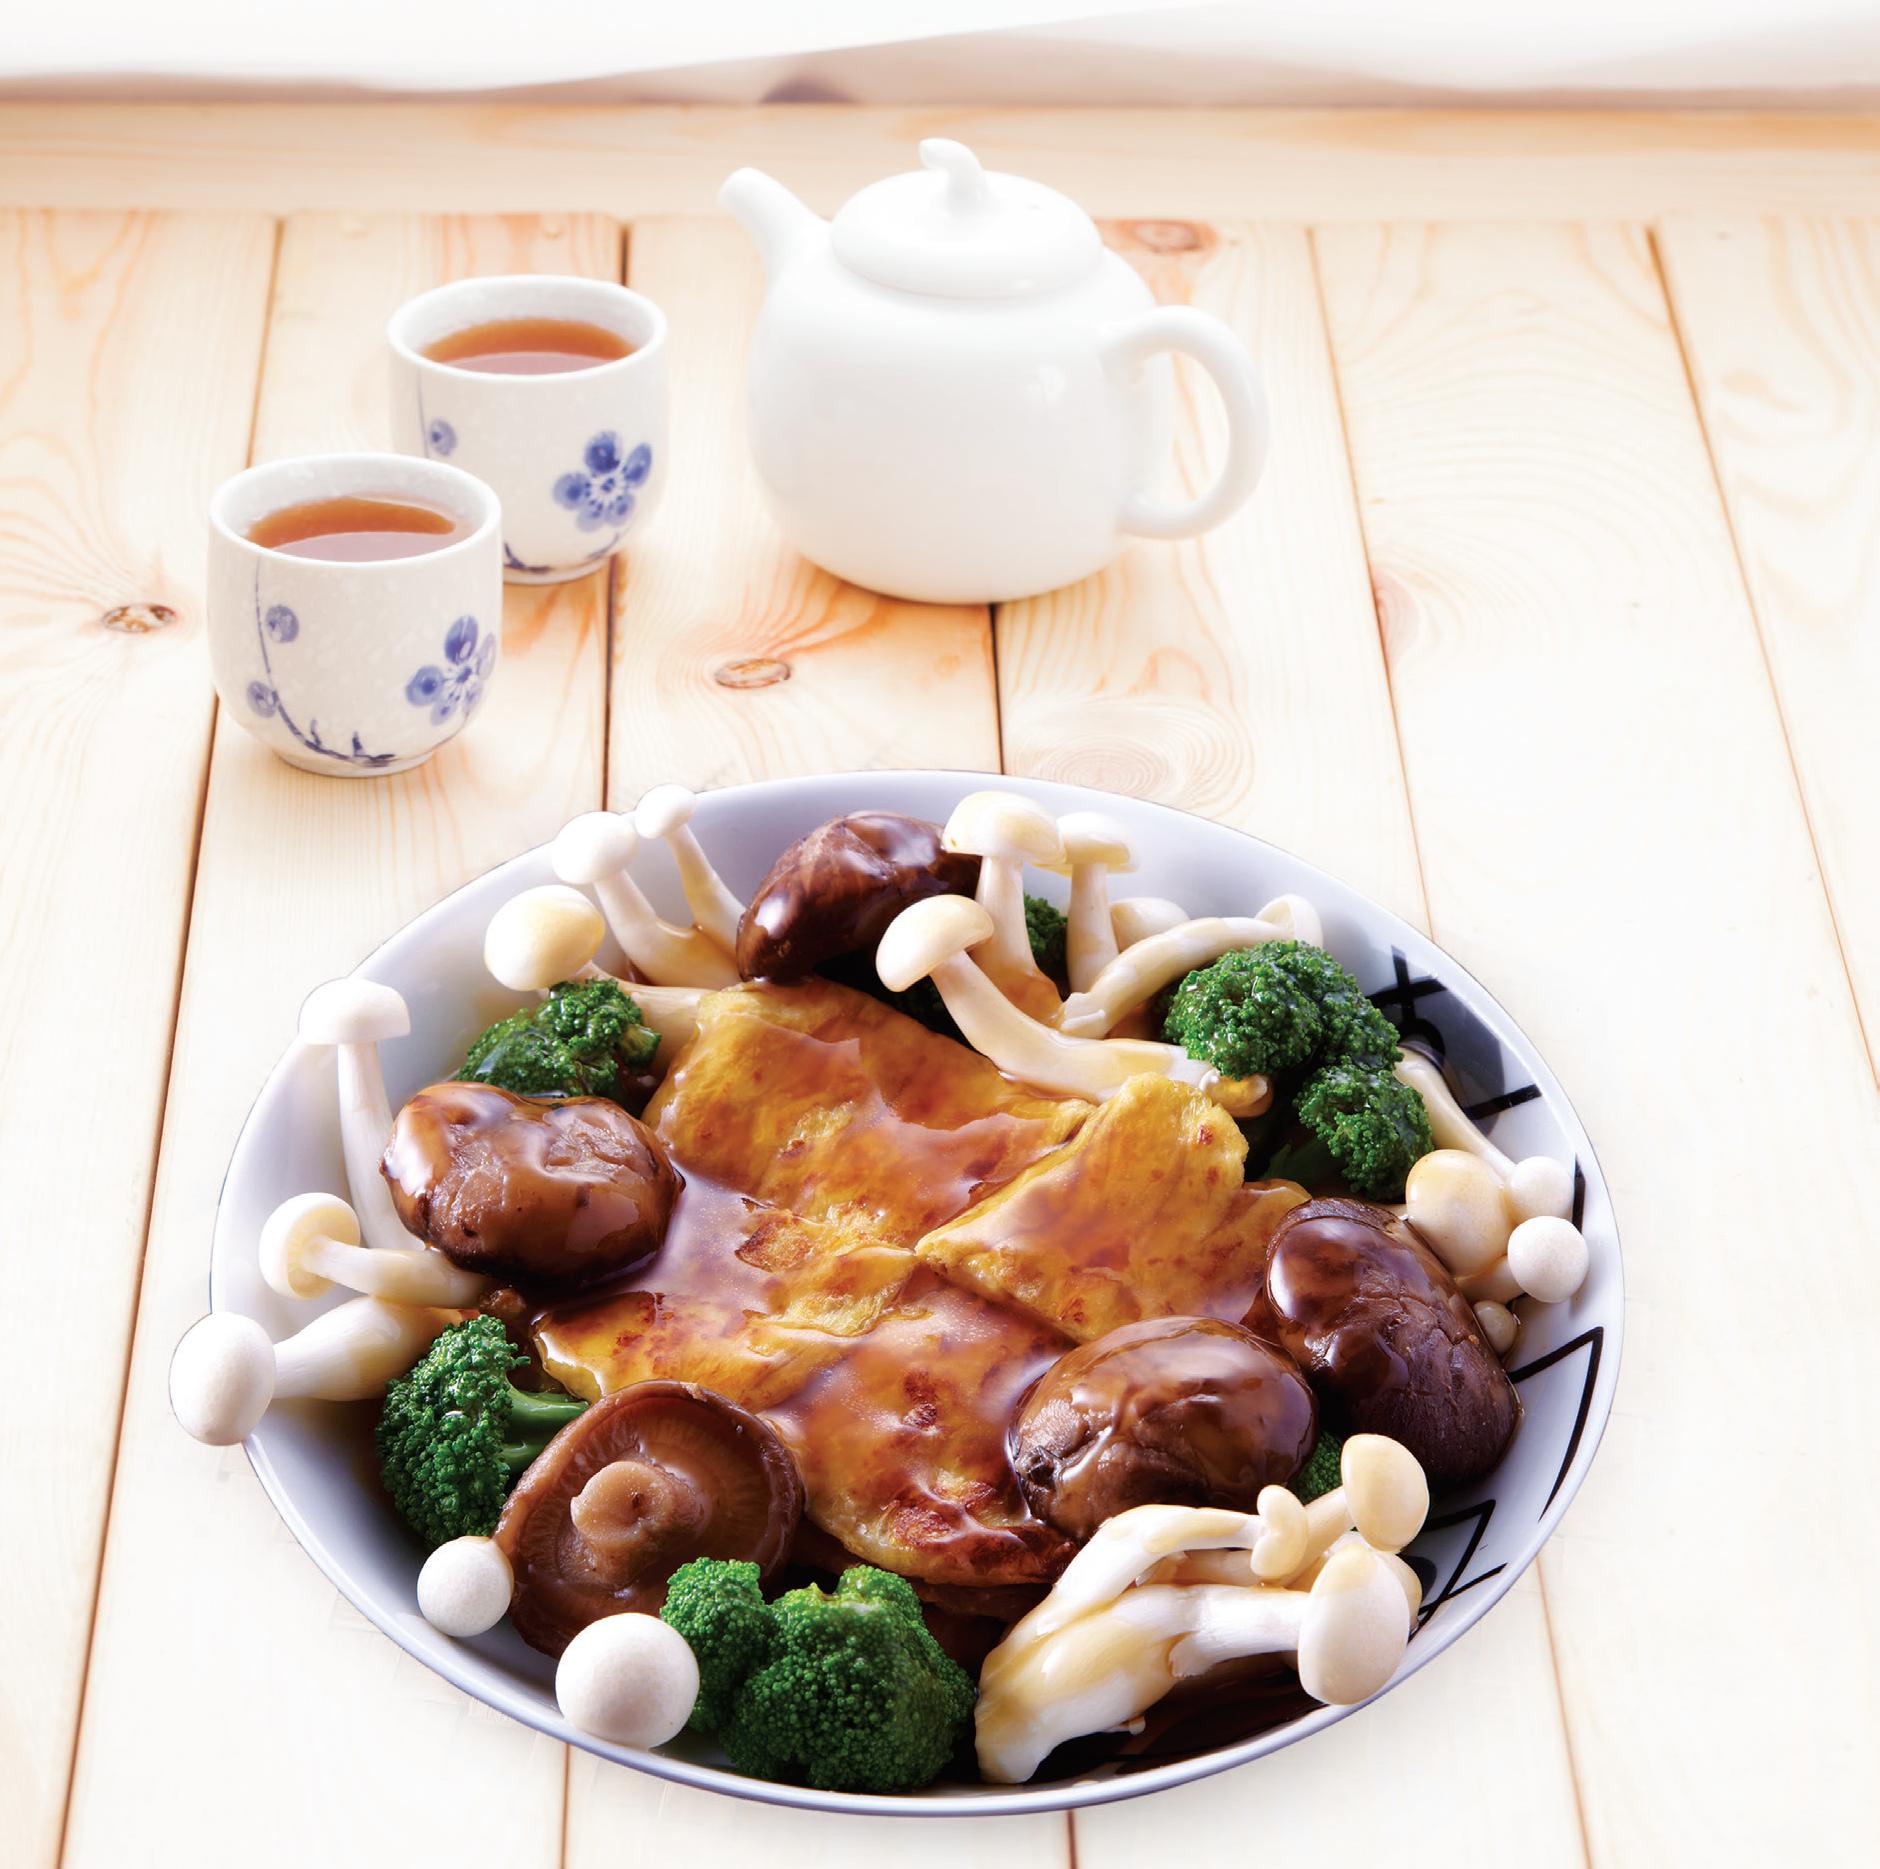 Mushroom vegetables with fried bean curd by Angel Brands